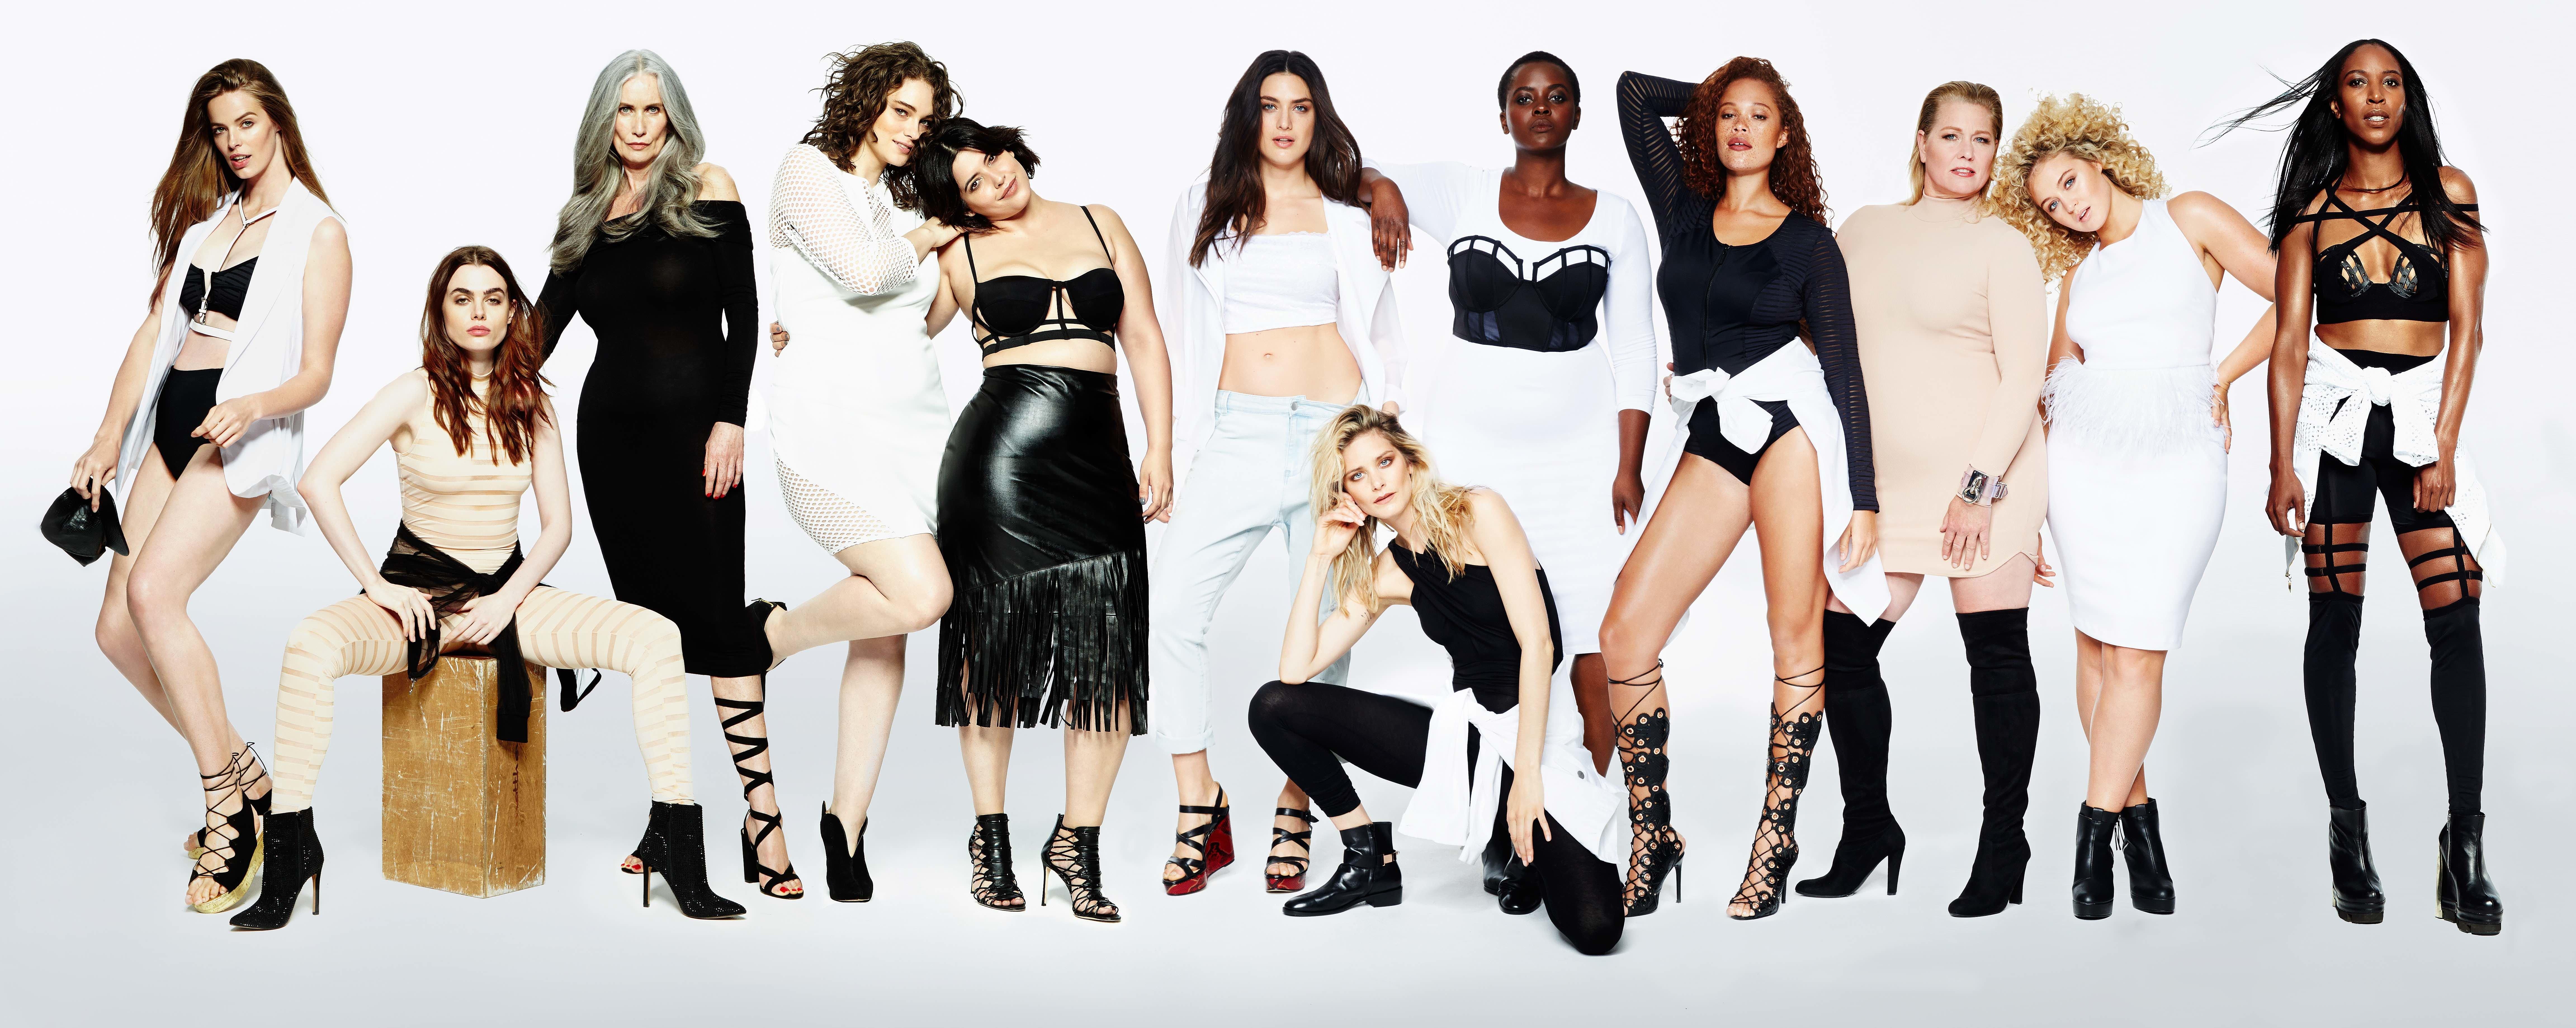 L to R: Robyn Lawley, Charl Howard, Nicola Griffin, Jennie Runk, Denise Bidot, Nathalia Novaes, Erica...